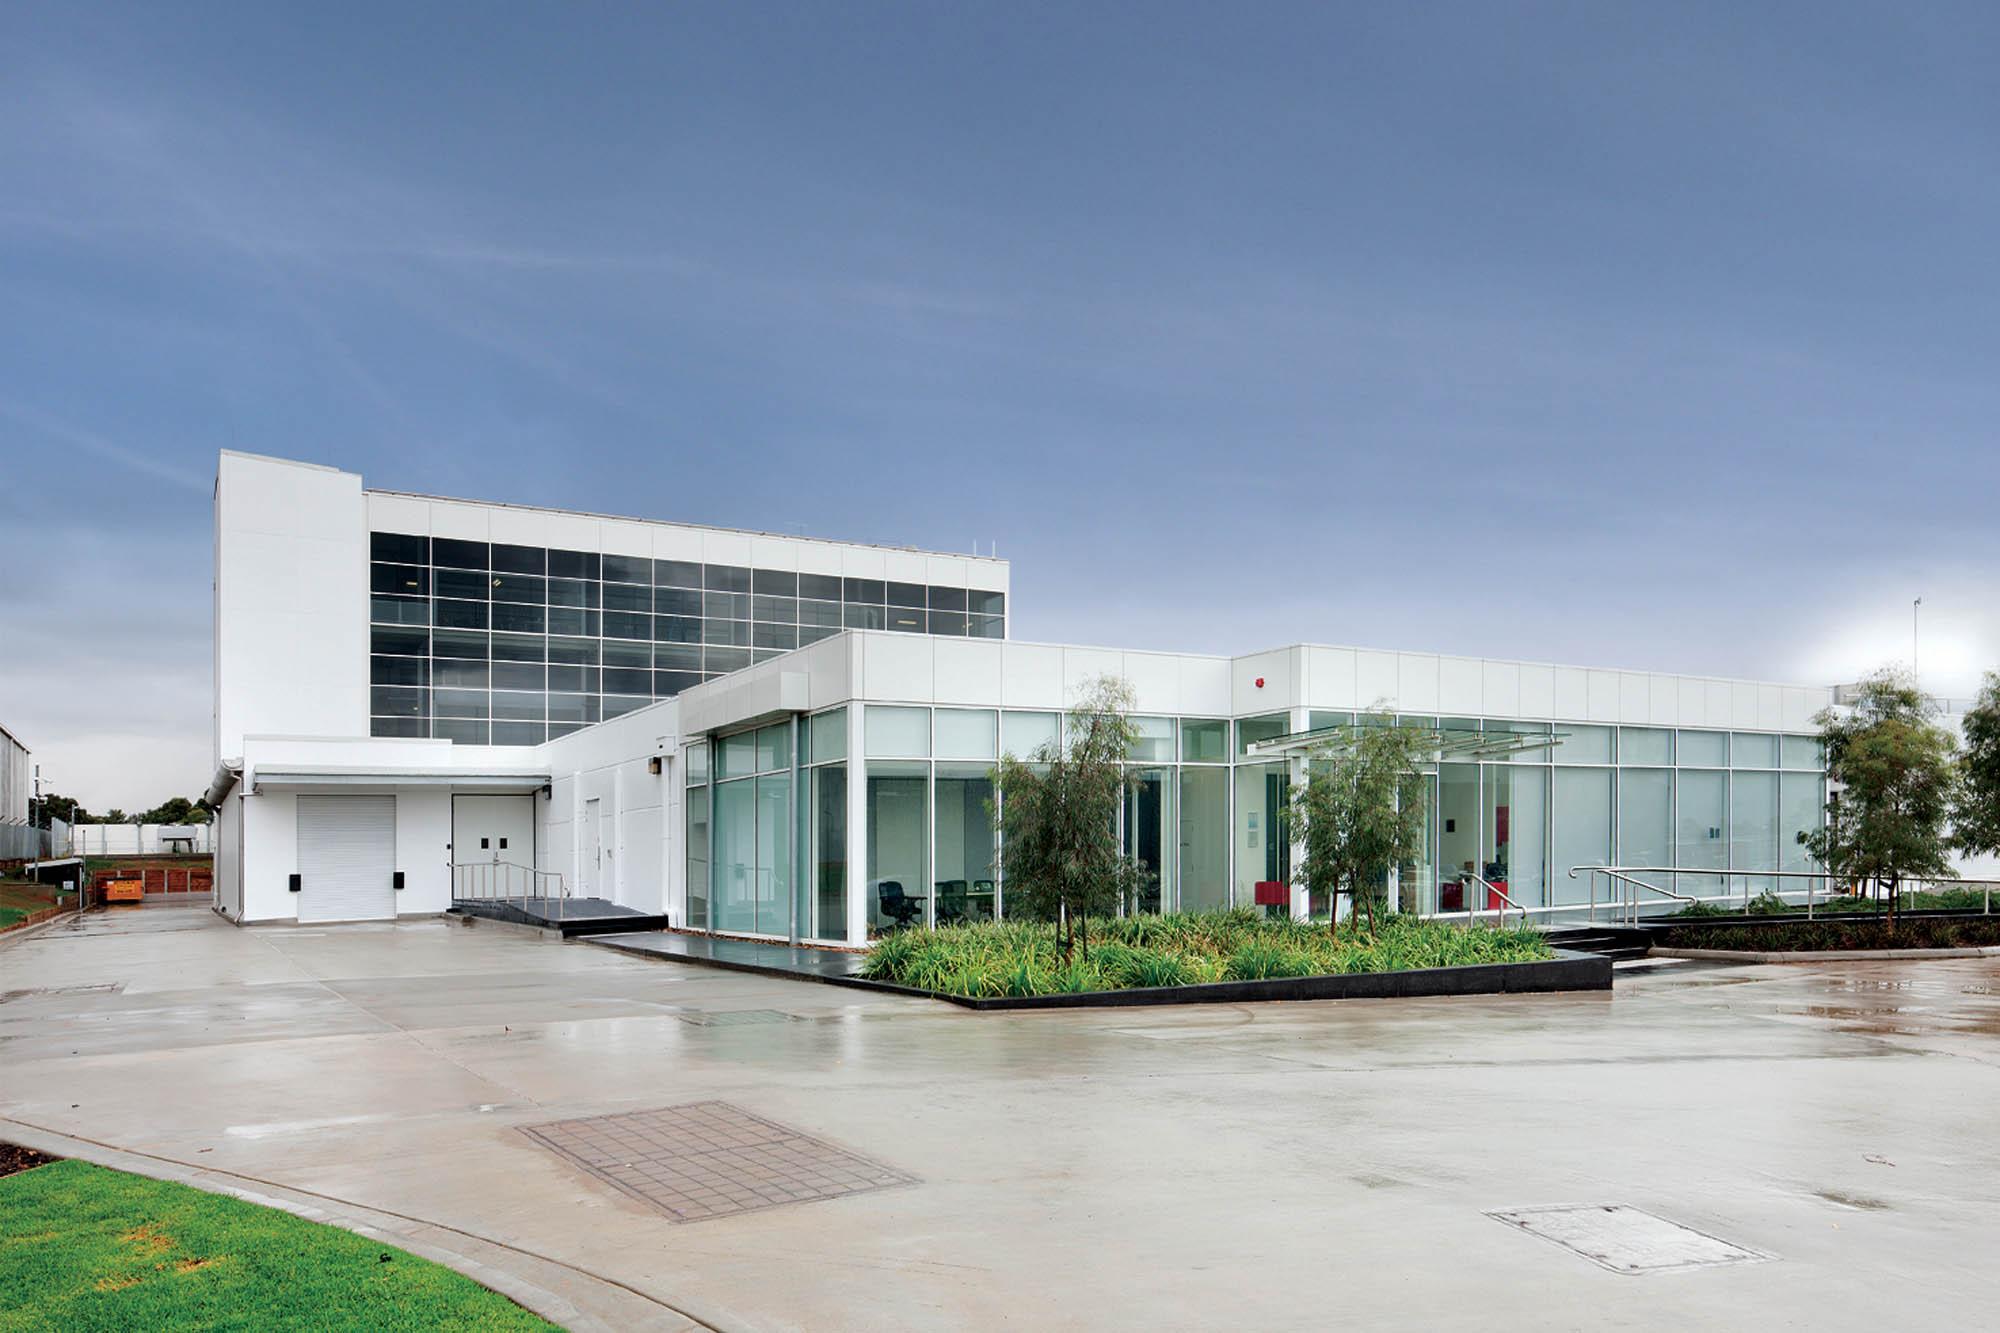 fujitsu vic construction fitout facility exterior